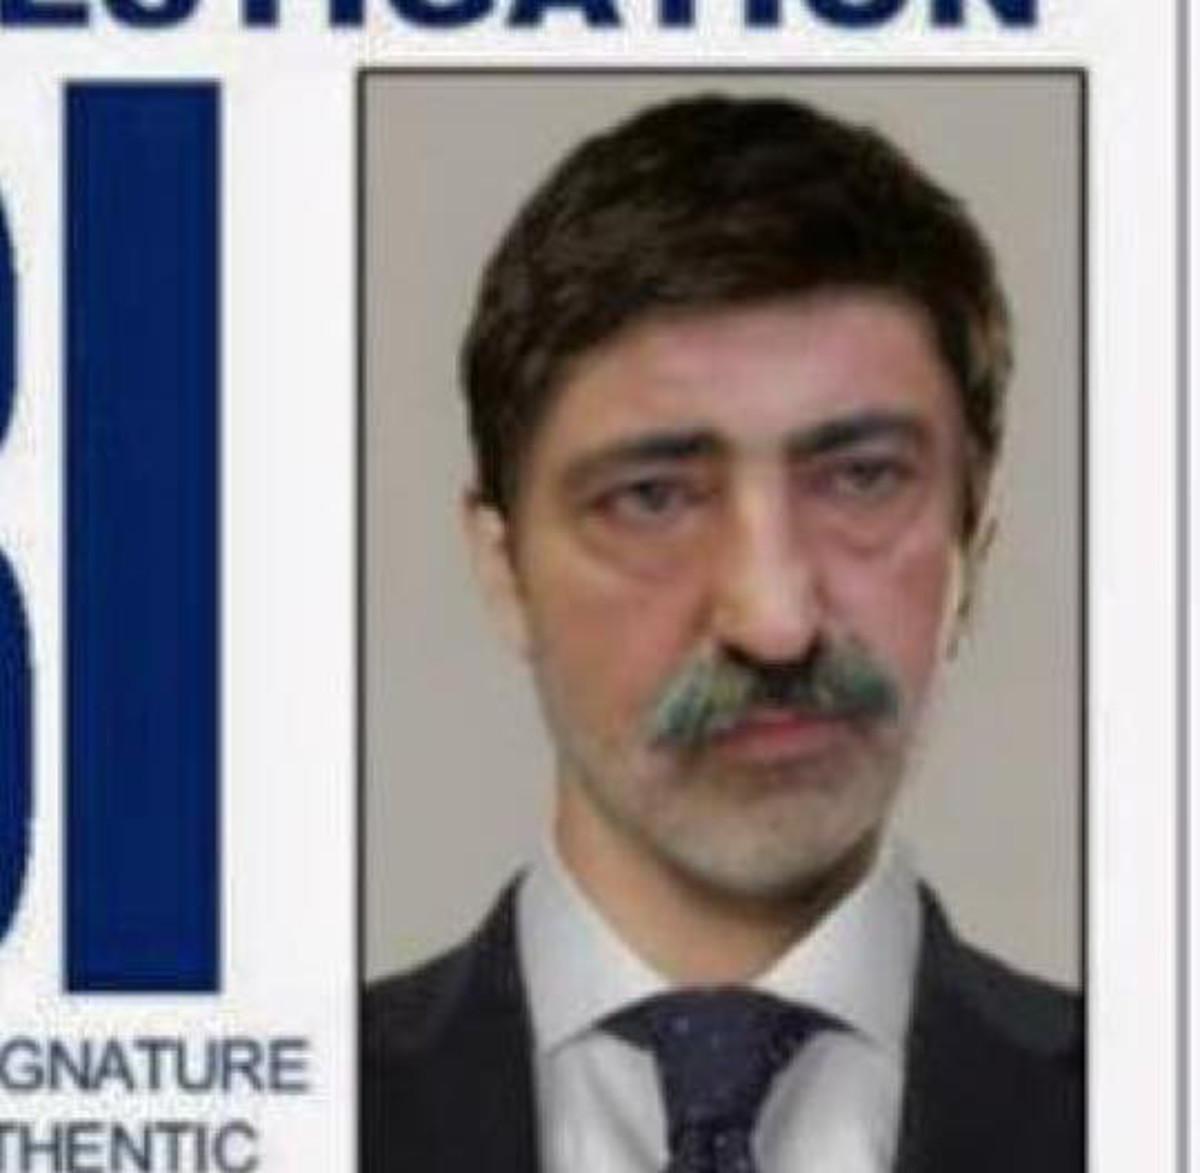 Novartis: Ο Πολάκης «κυνηγά» τον Λοβέρδο ως… πράκτορας του FBI | Newsit.gr